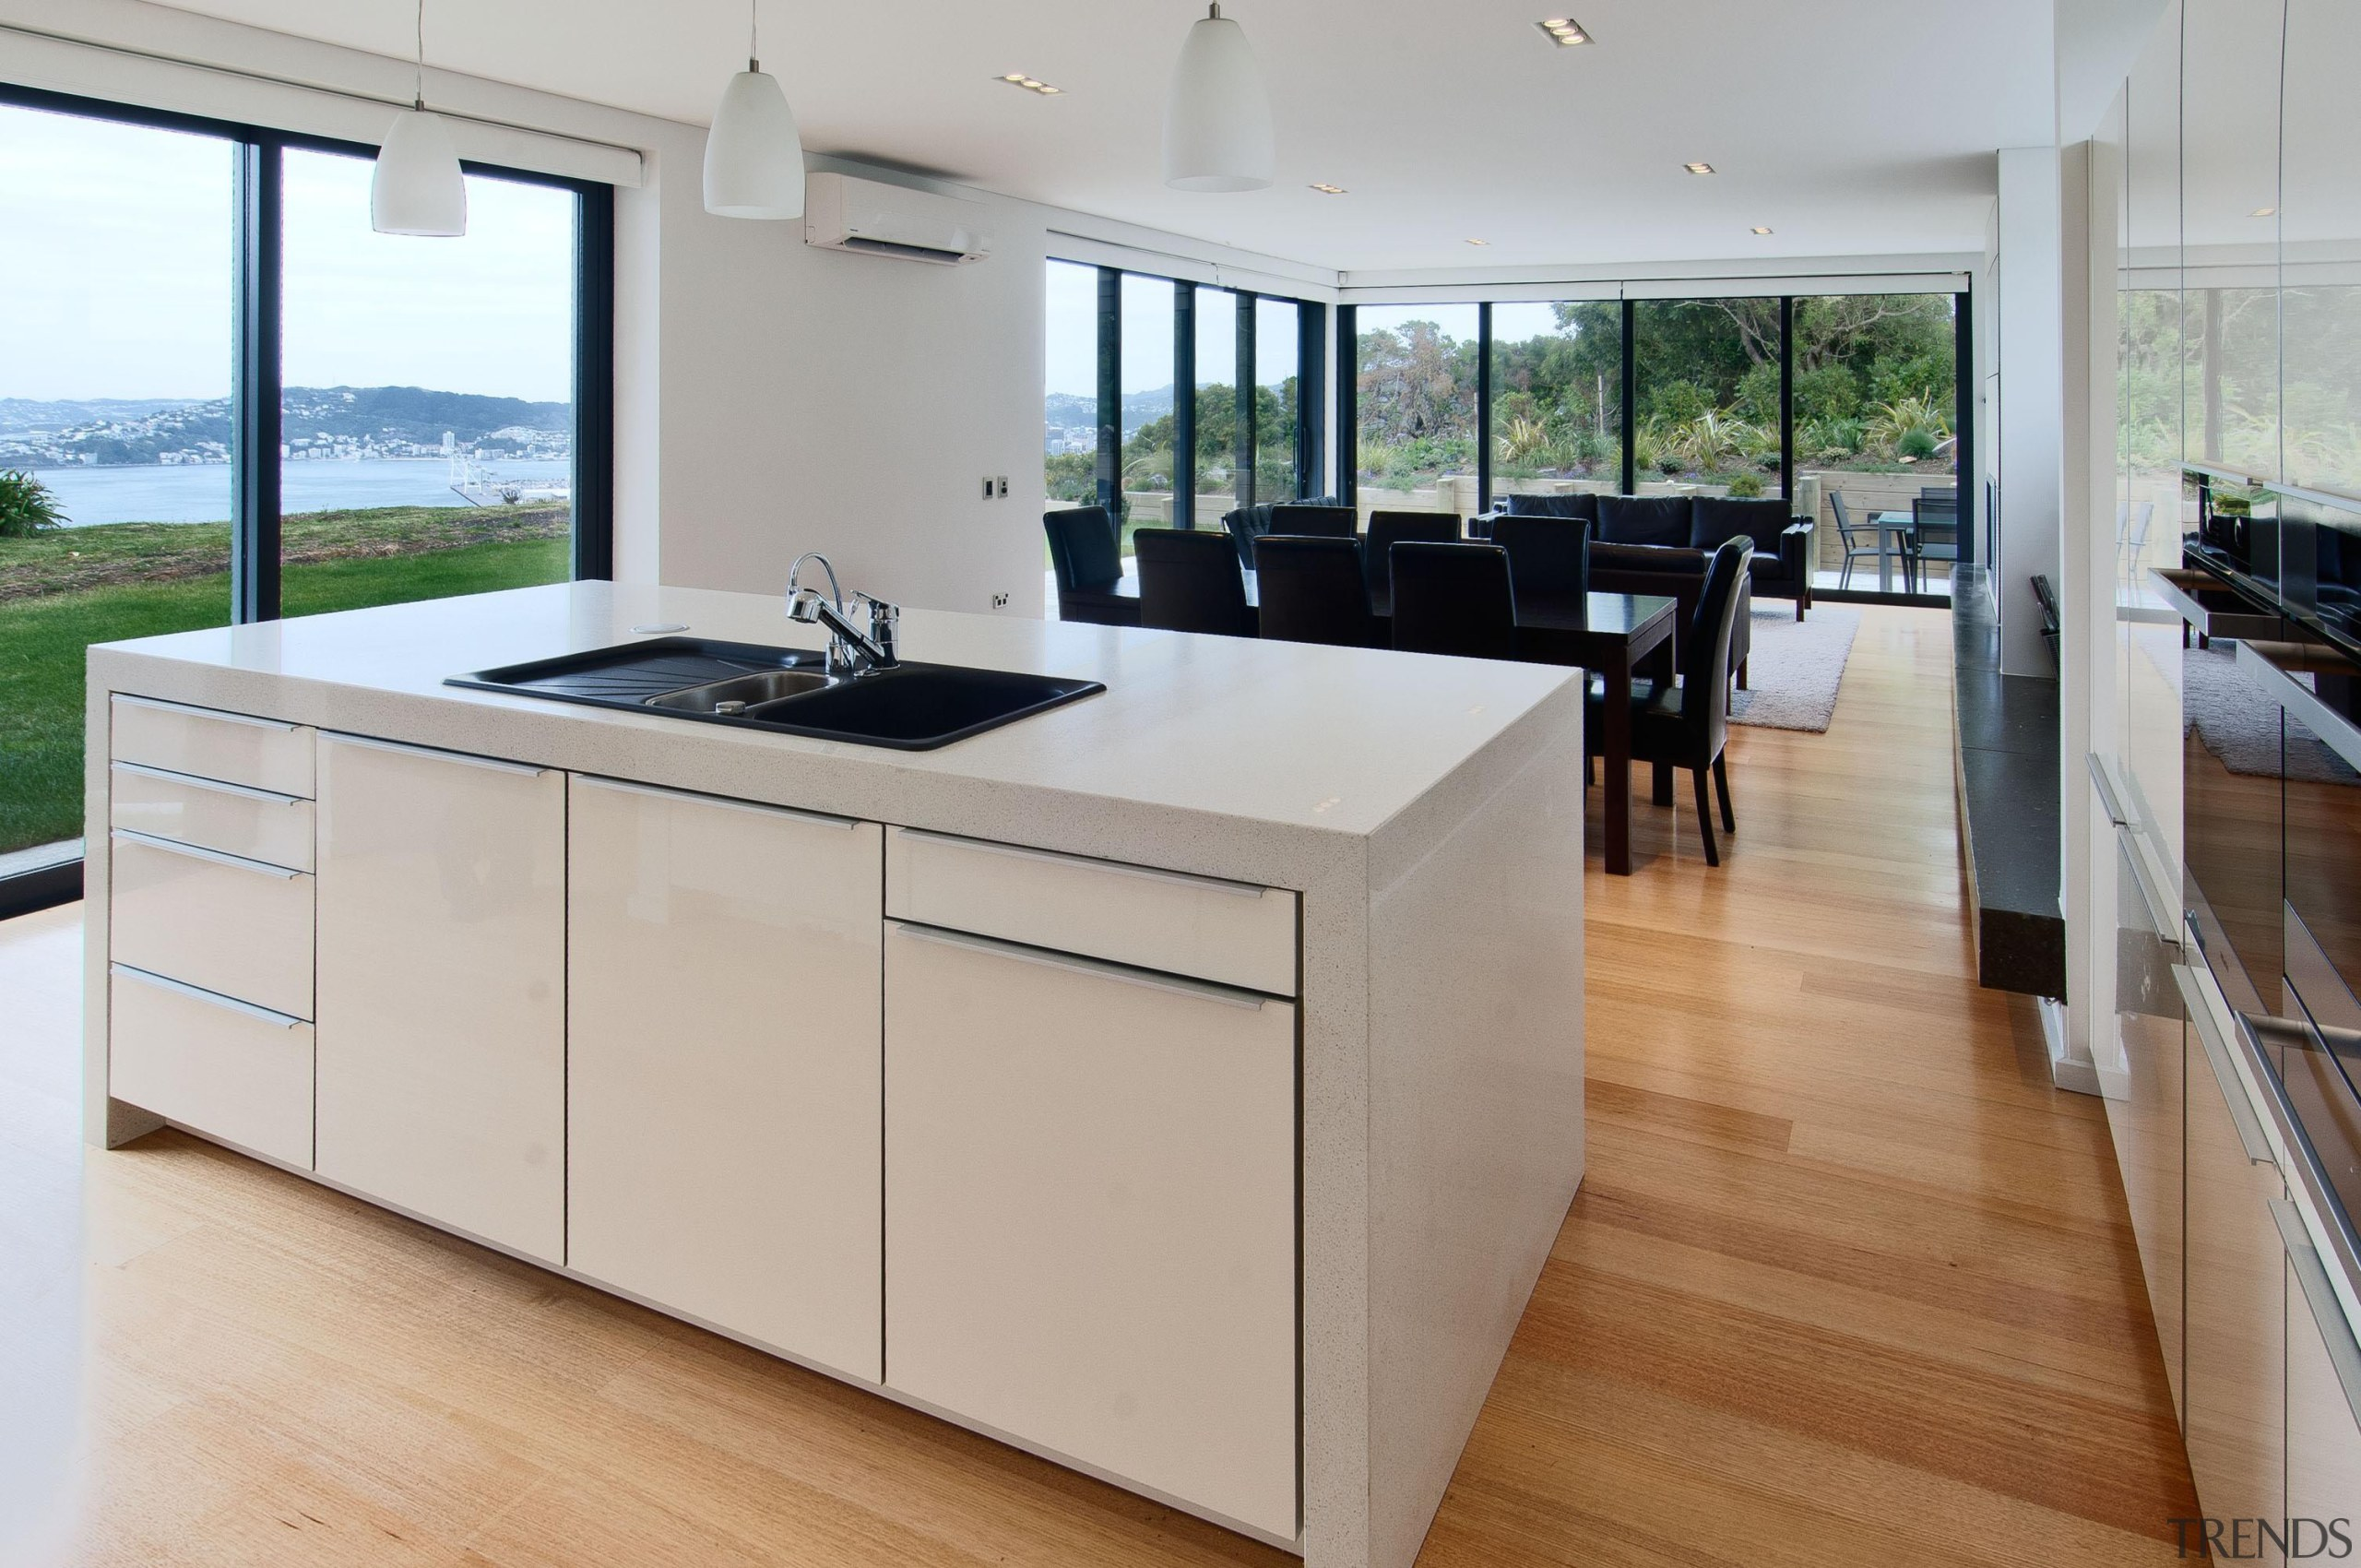 Khandallah Kitchen - Khandallah Kitchen - countertop | countertop, floor, flooring, interior design, kitchen, real estate, wood flooring, gray